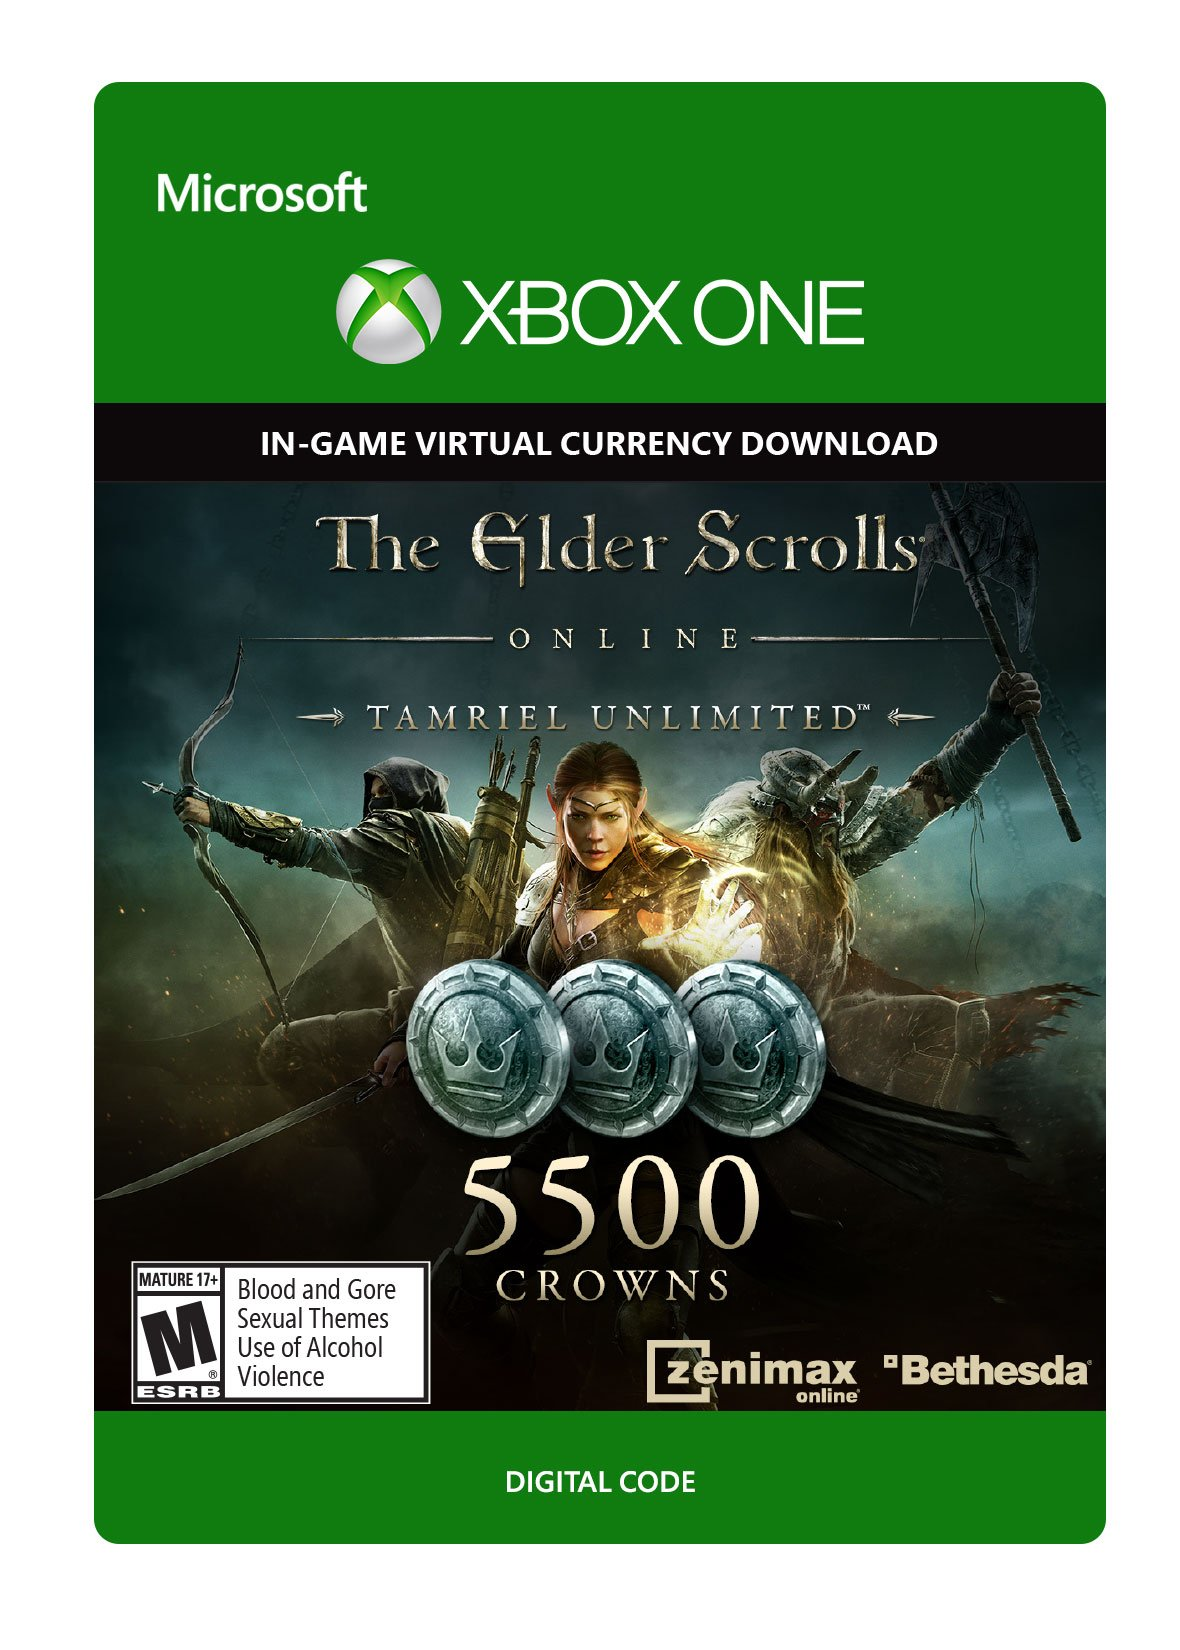 The Elder Scrolls Online Tamriel Unlimited Edition 5,500 Crowns - Xbox One Digital Code